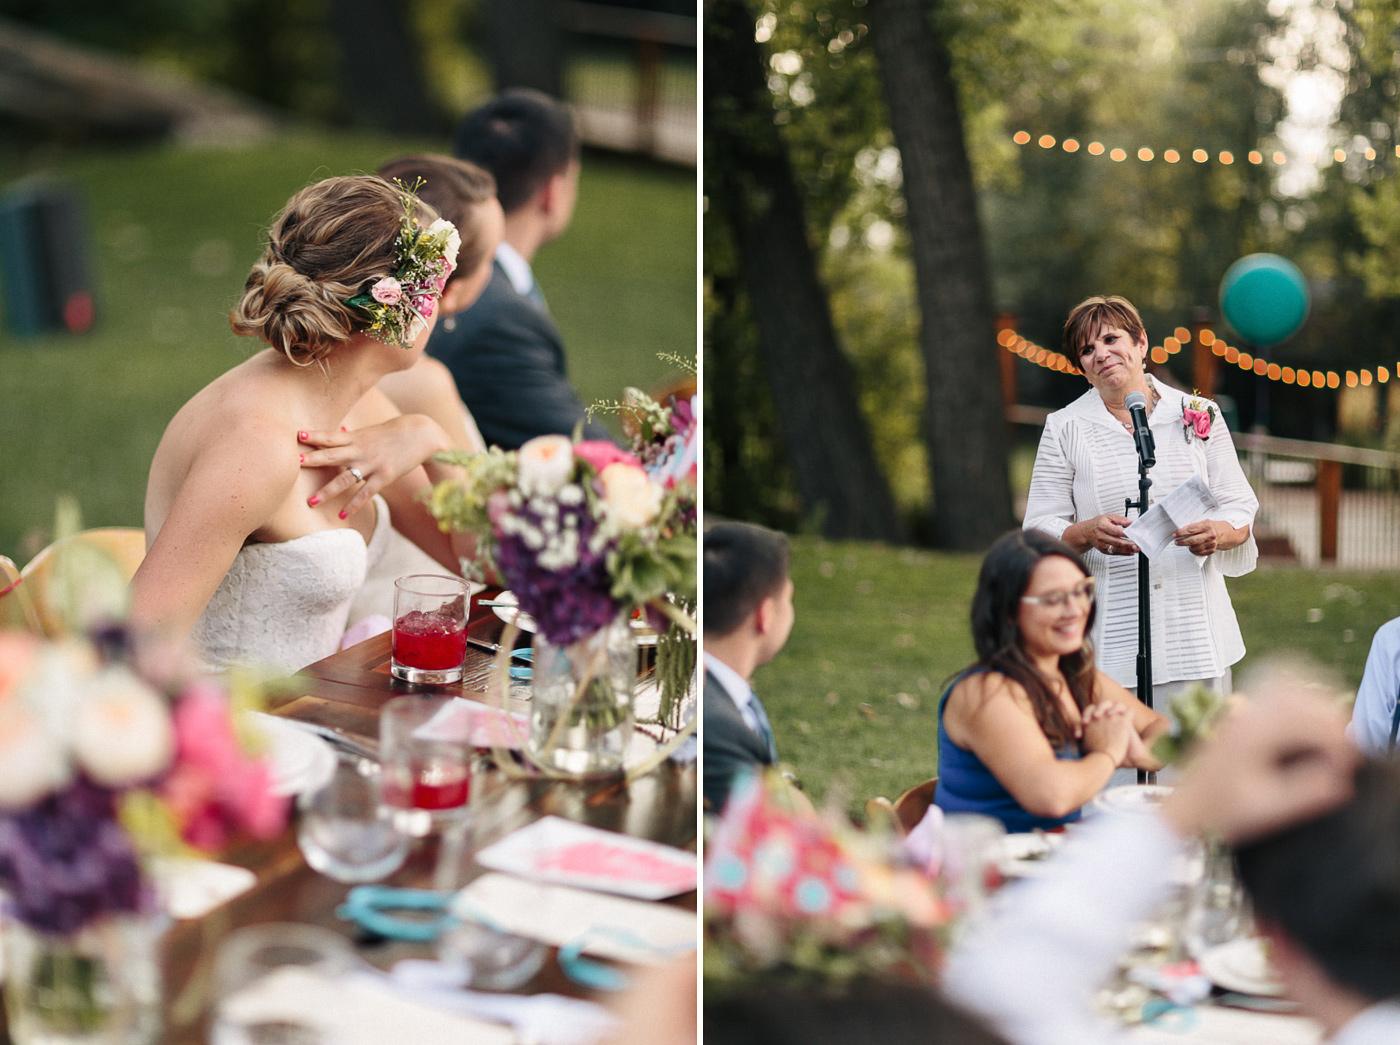 Lyons-Farmette-Wedding-Photographer-Lucy-Austin-Flash-Mob-Dance-45.jpg